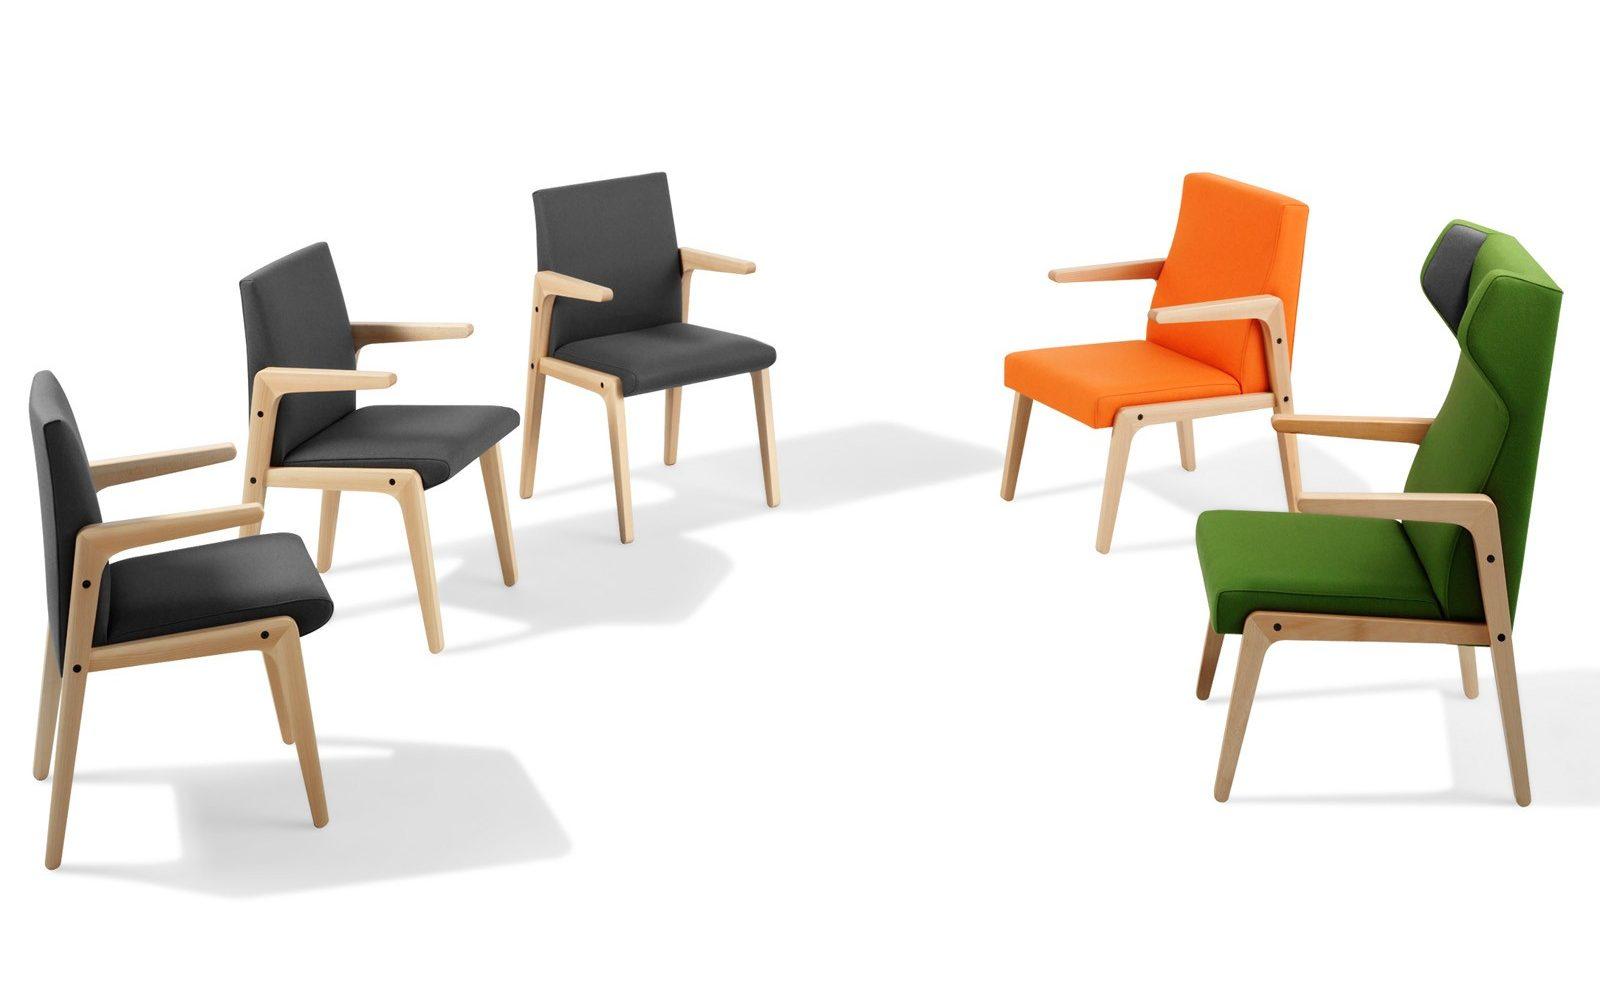 kezu_proyec_boomerang_chairs_healthcare furniture